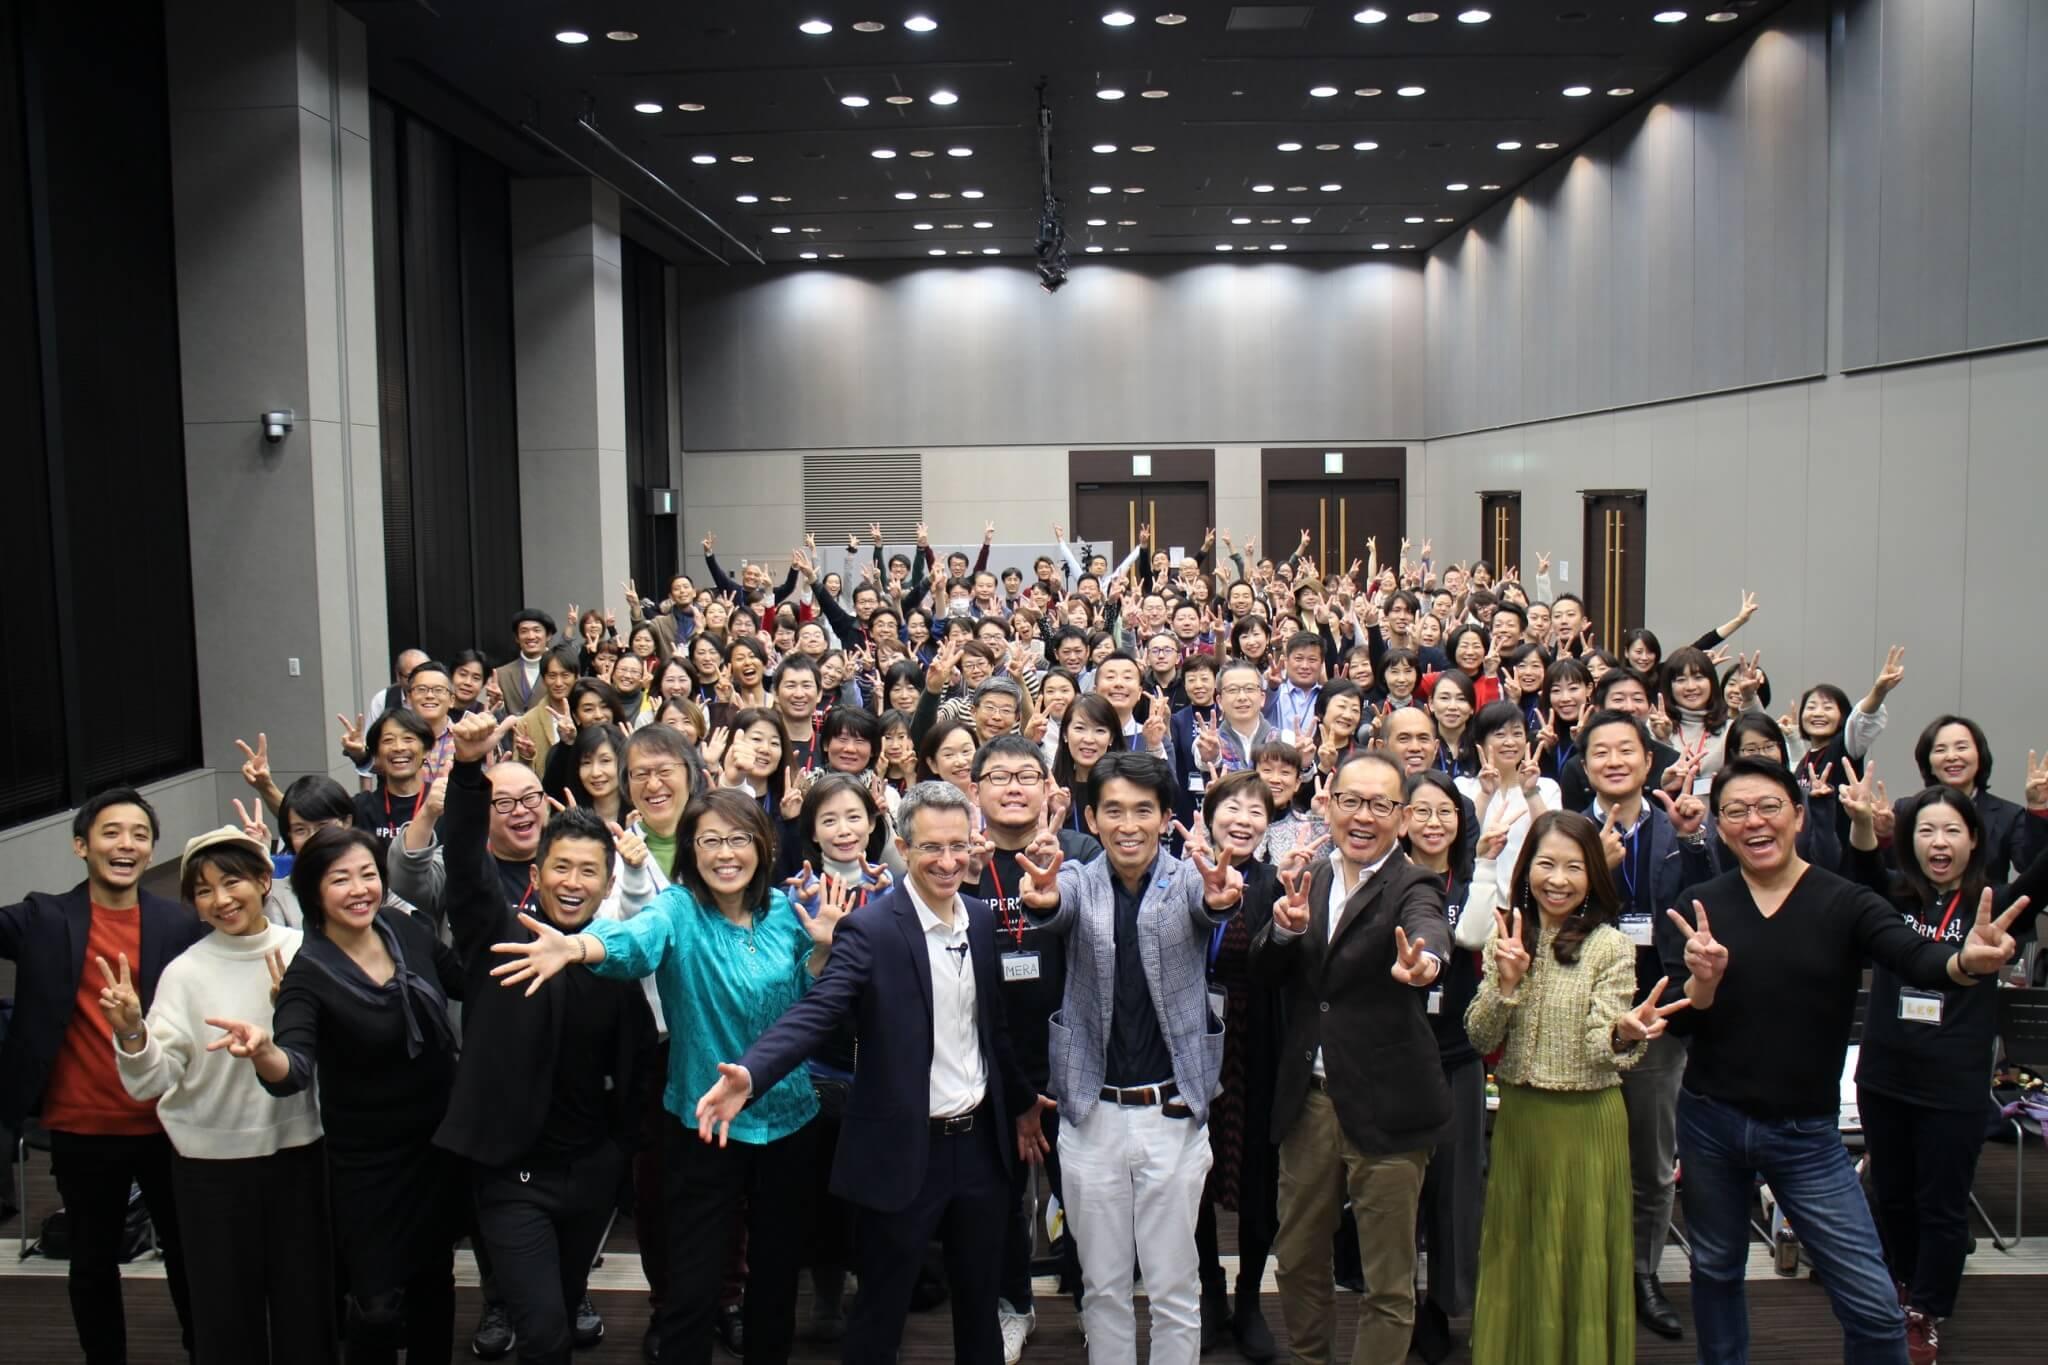 Photo Report / タル・ベン・シャハー博士来日WS / 2019.12.14-15